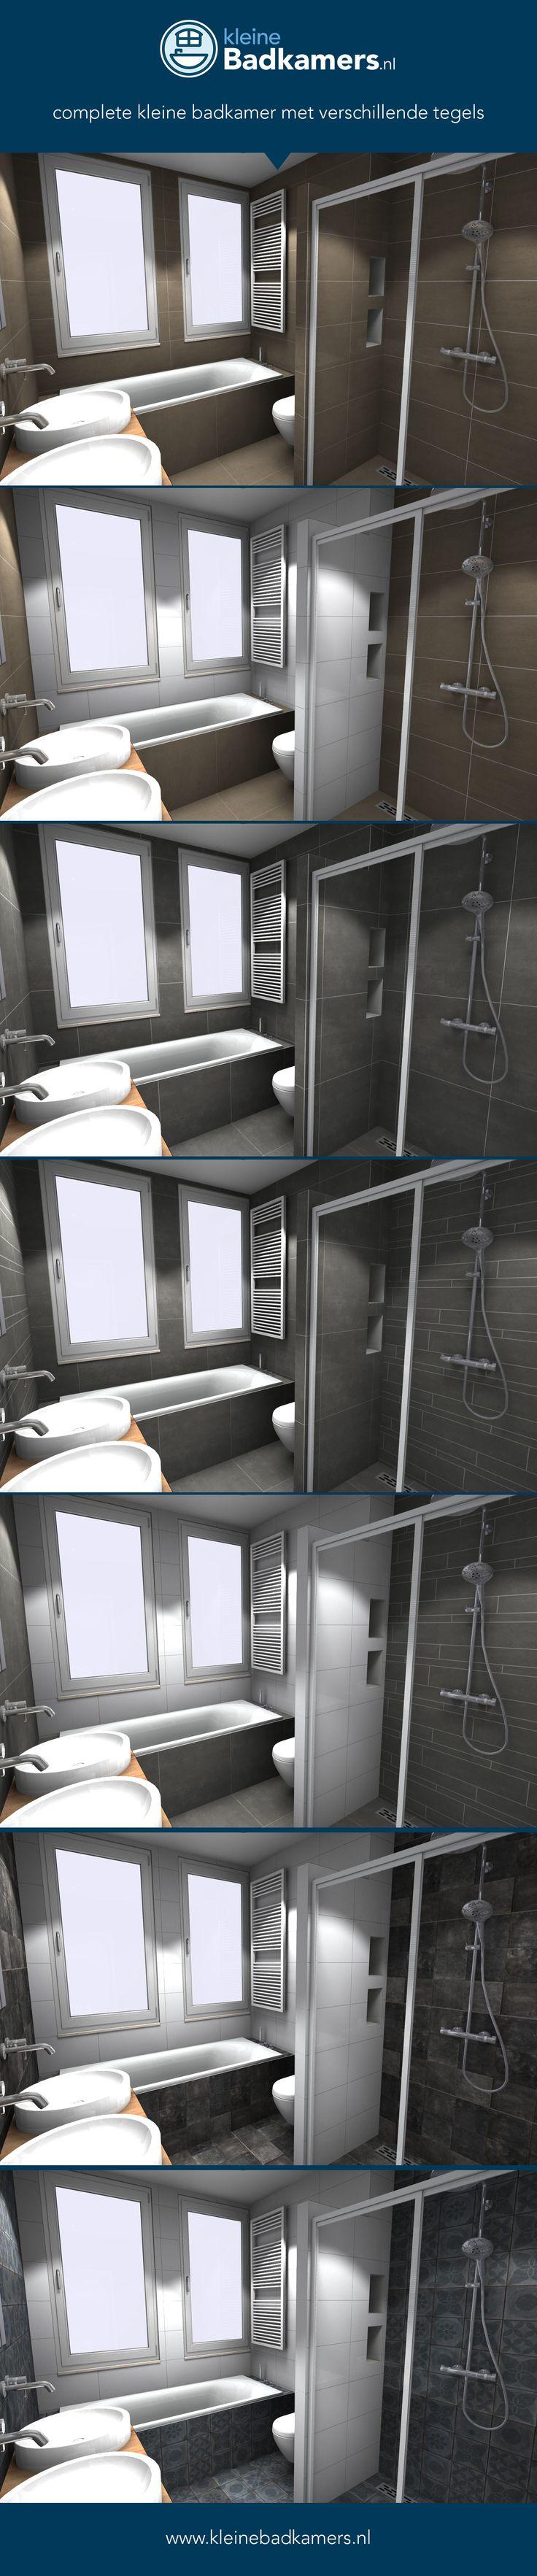 ... .nl/kleine-badkamer-inrichten/tegels-kleine-badkamer-vergelijken